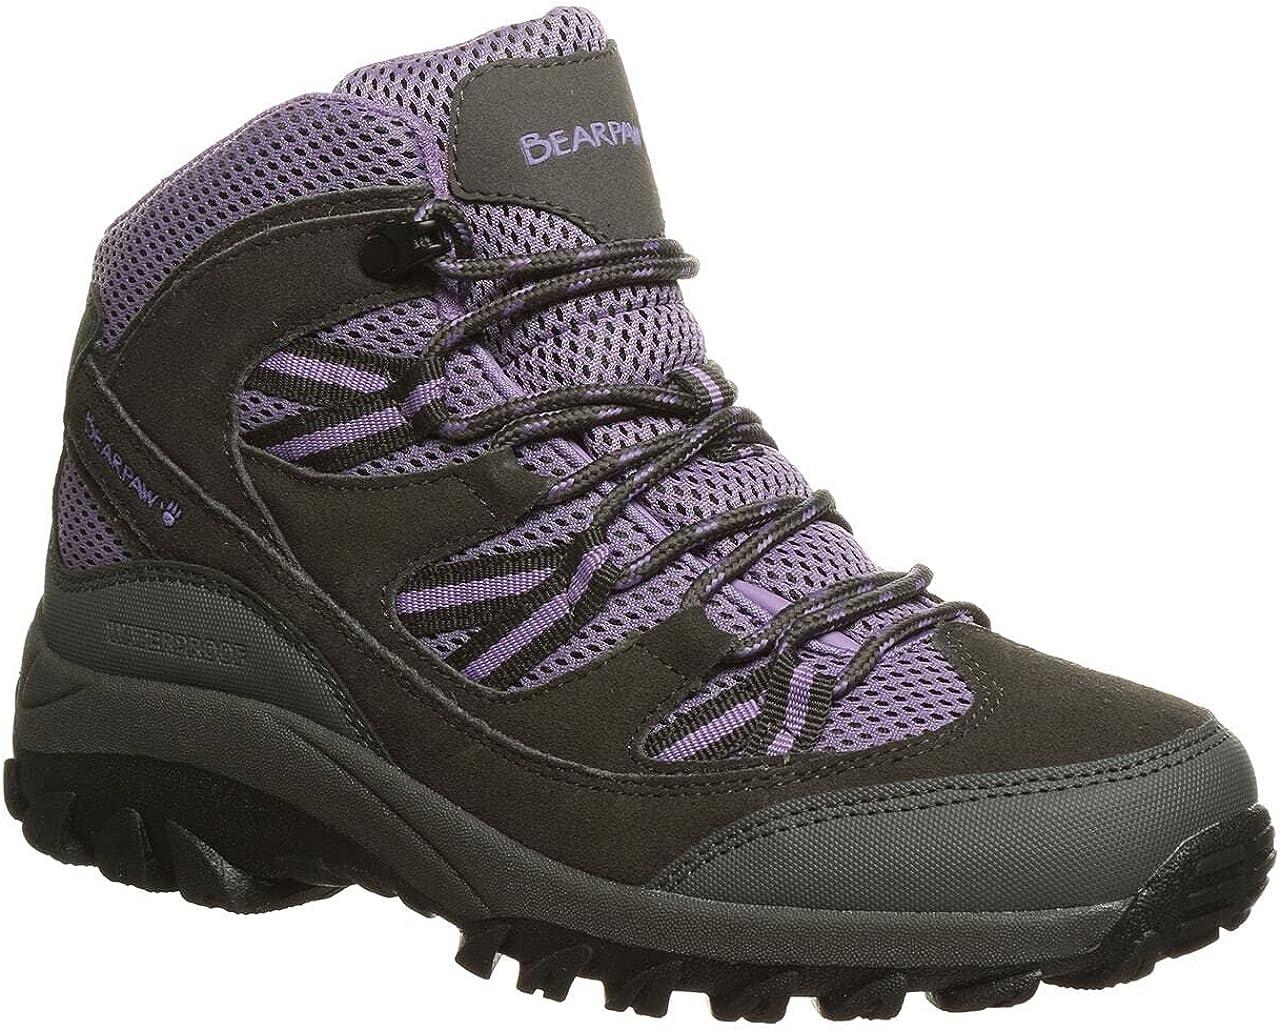   BEARPAW Women's Tallac Boot Hiker   Hiking Boots